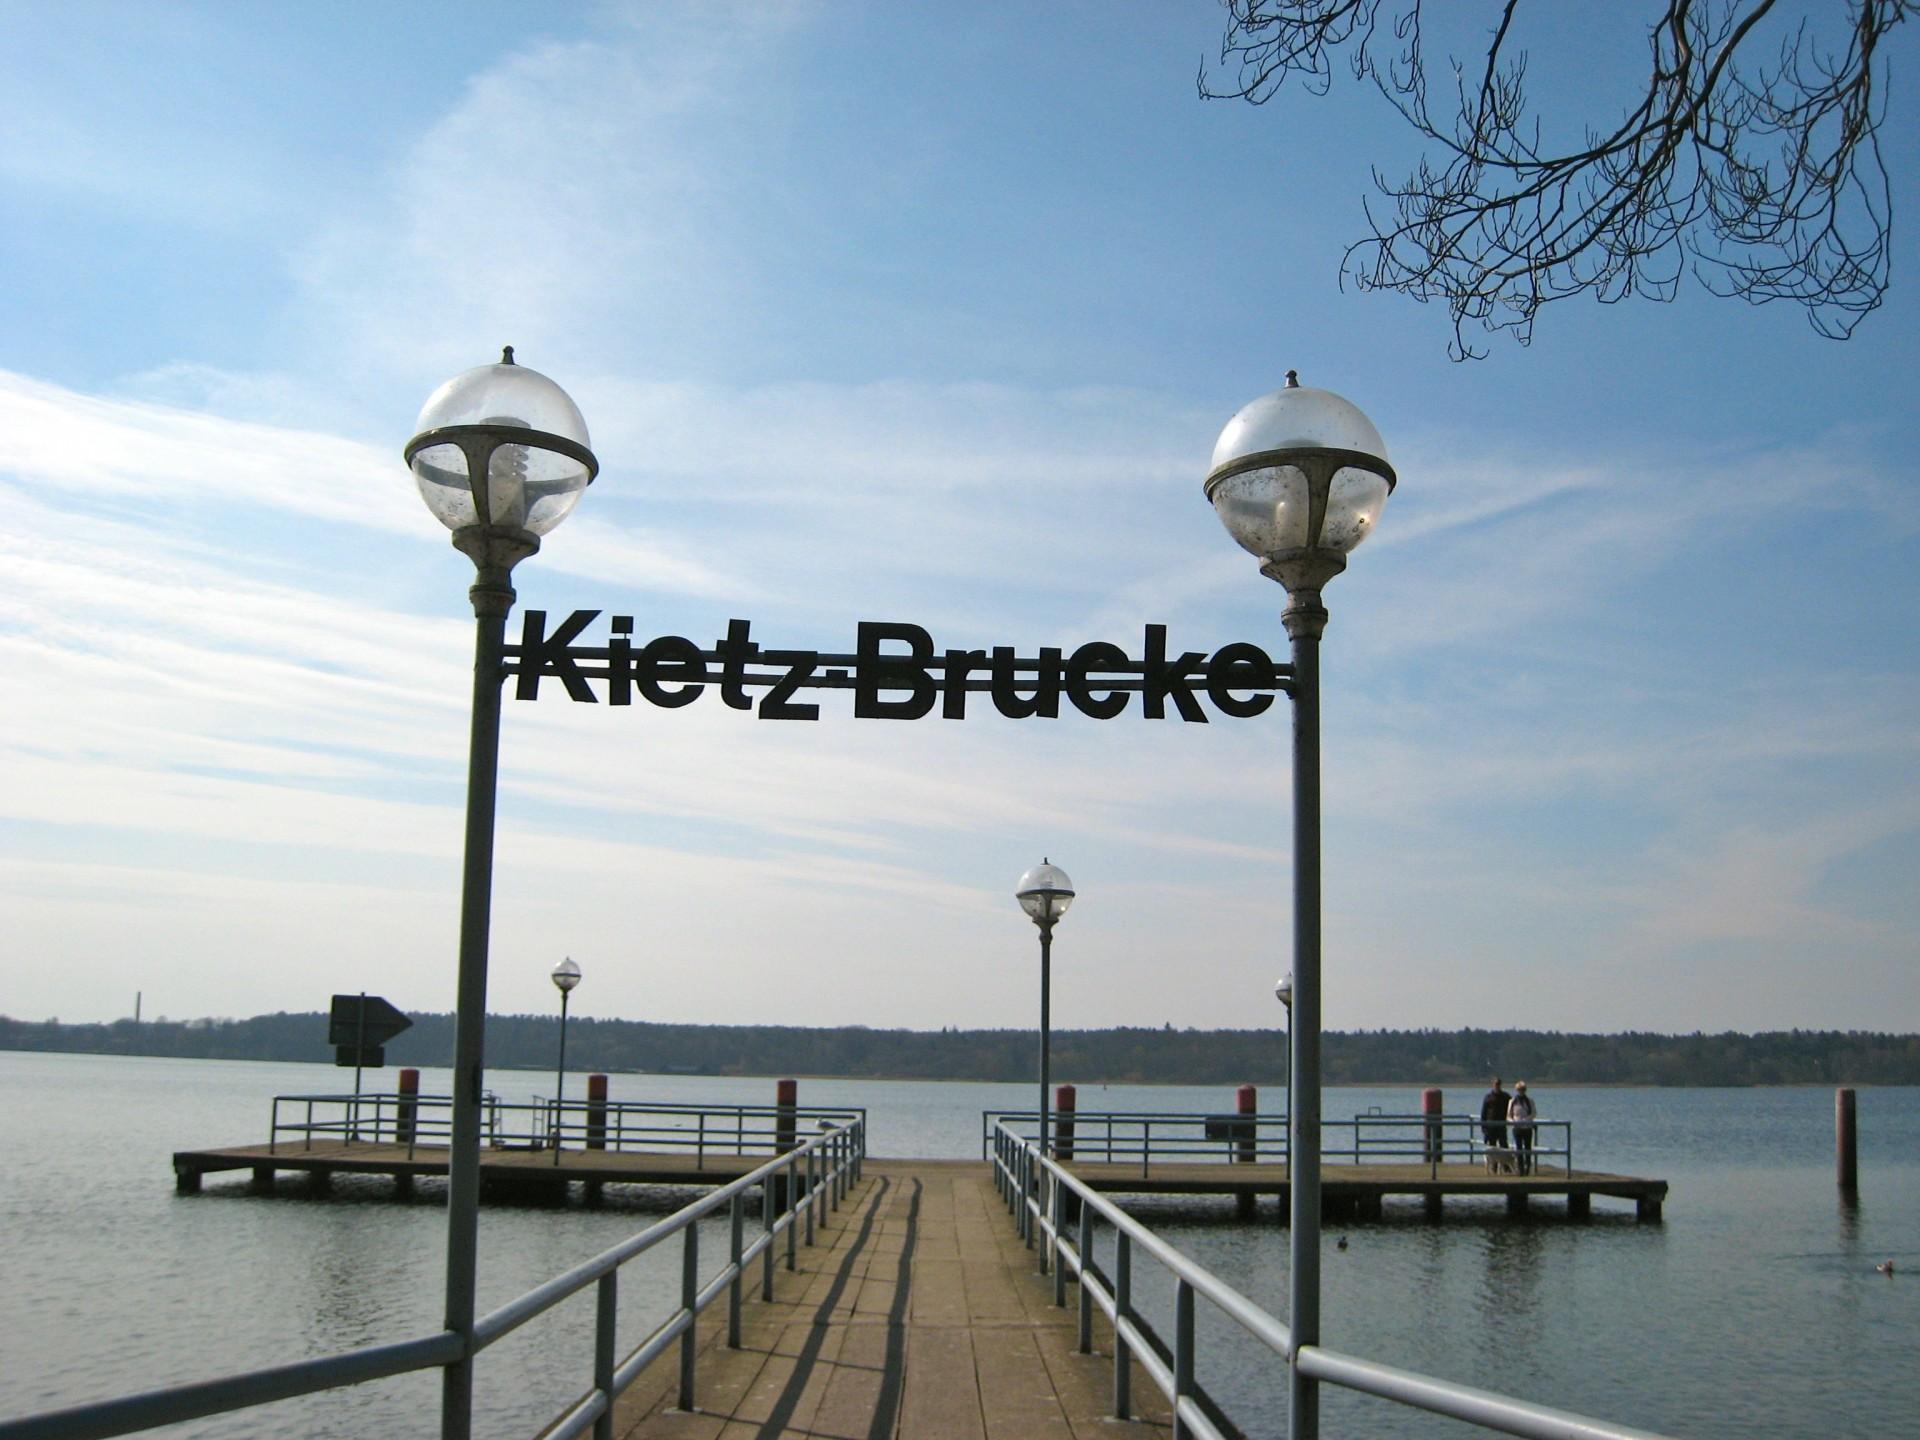 Kietzbruecke